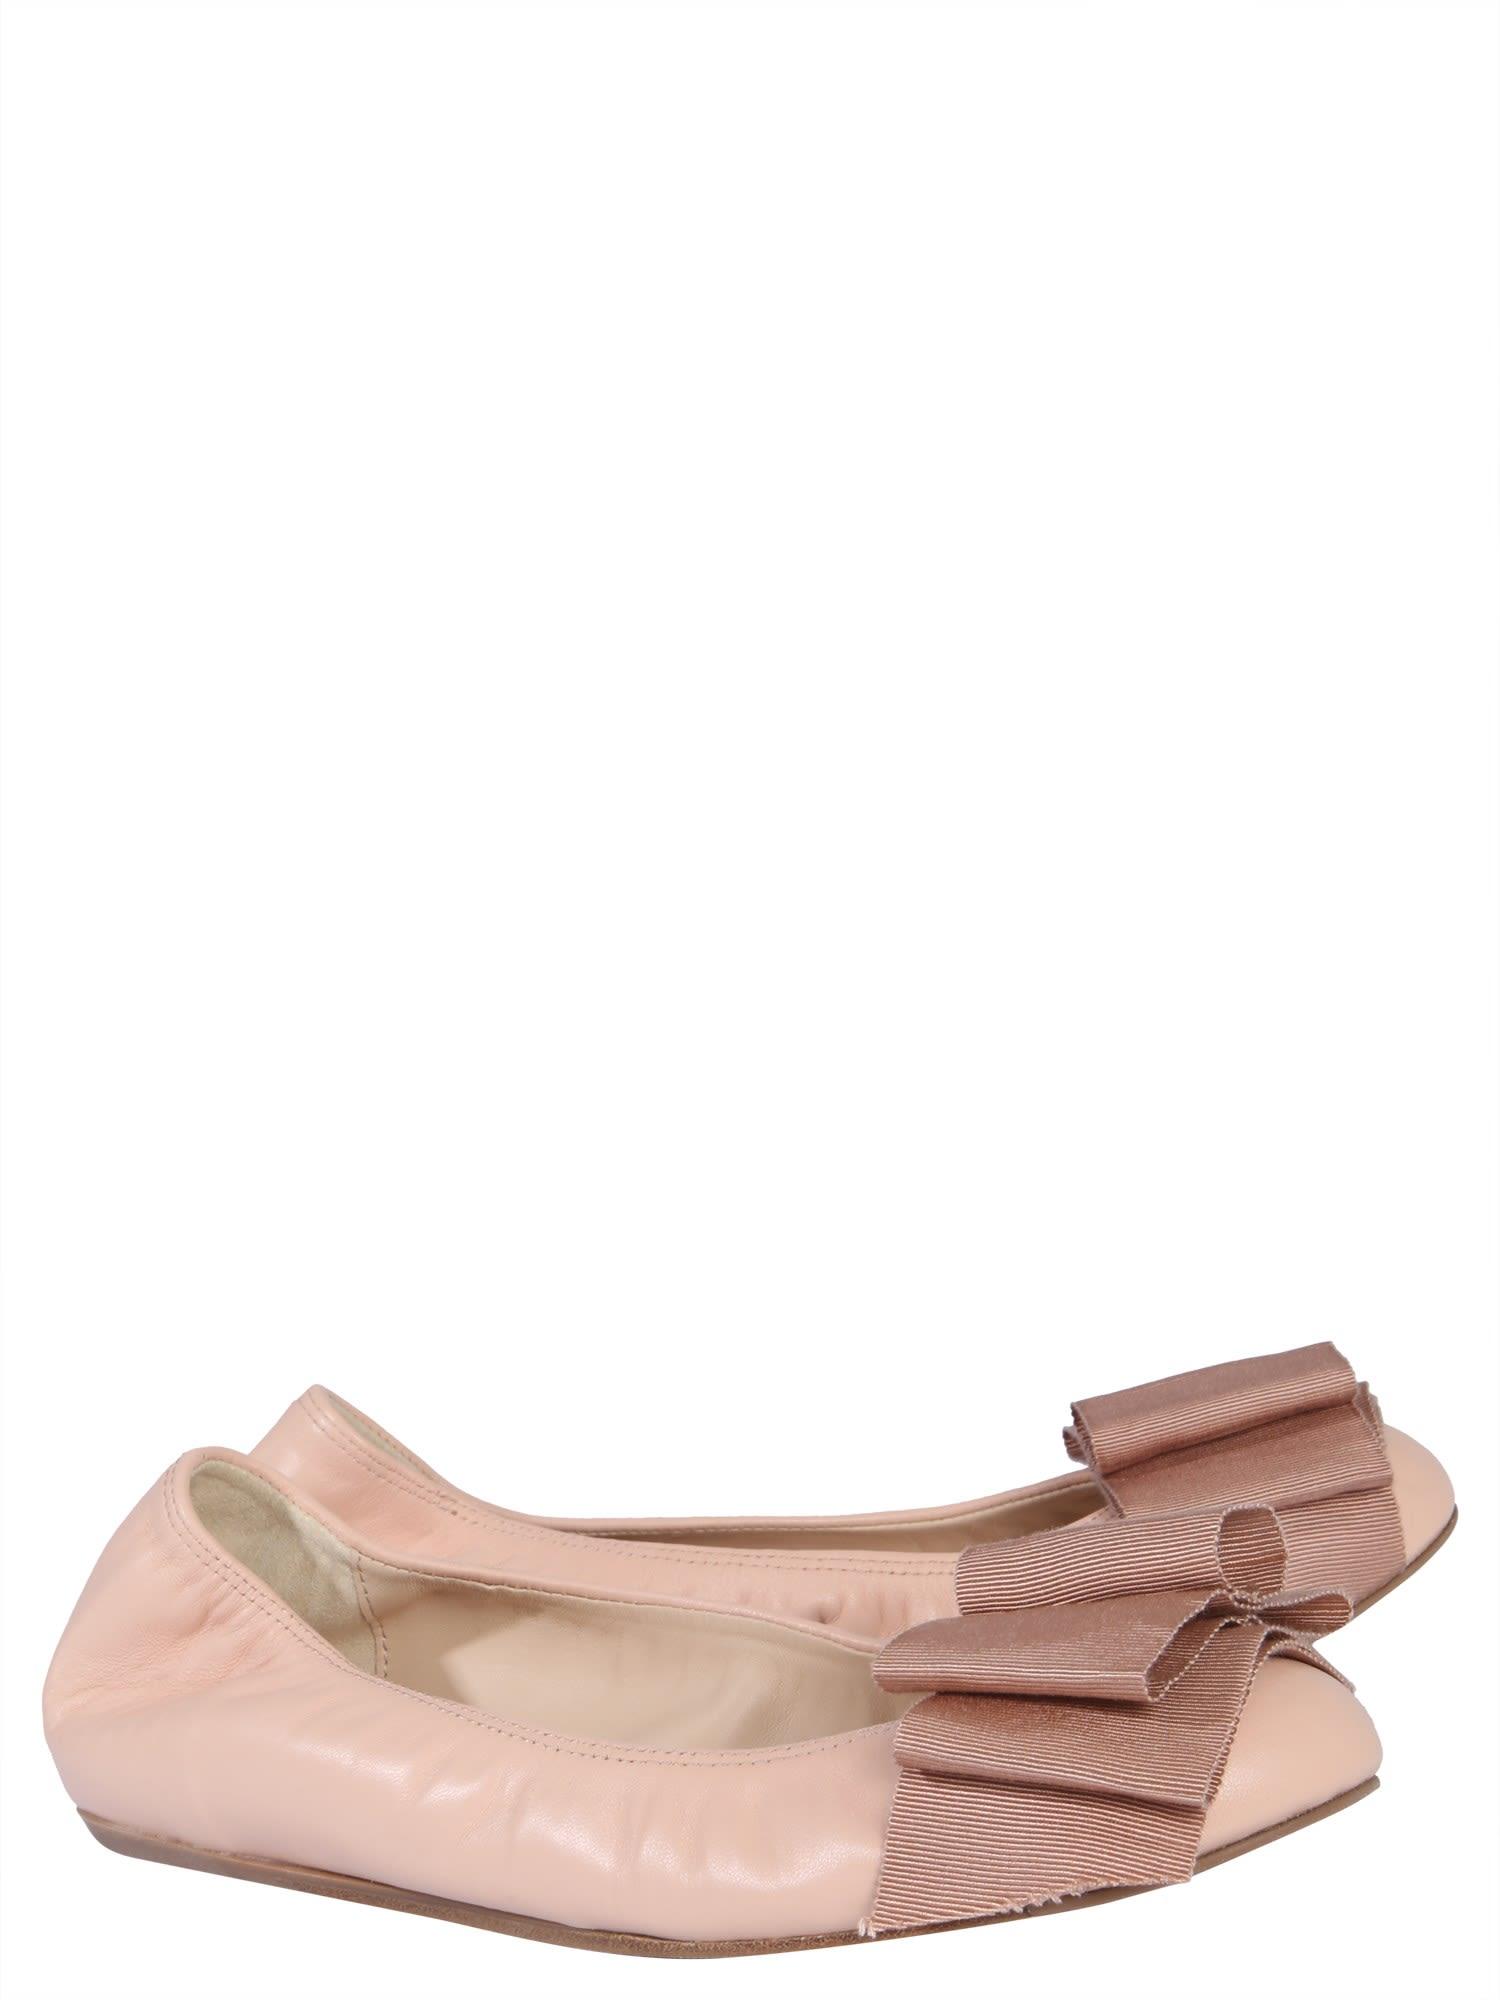 0a5a72c60d9c9 Lanvin Lanvin Bow Trim Ballerinas - NUDE - 10923779 | italist